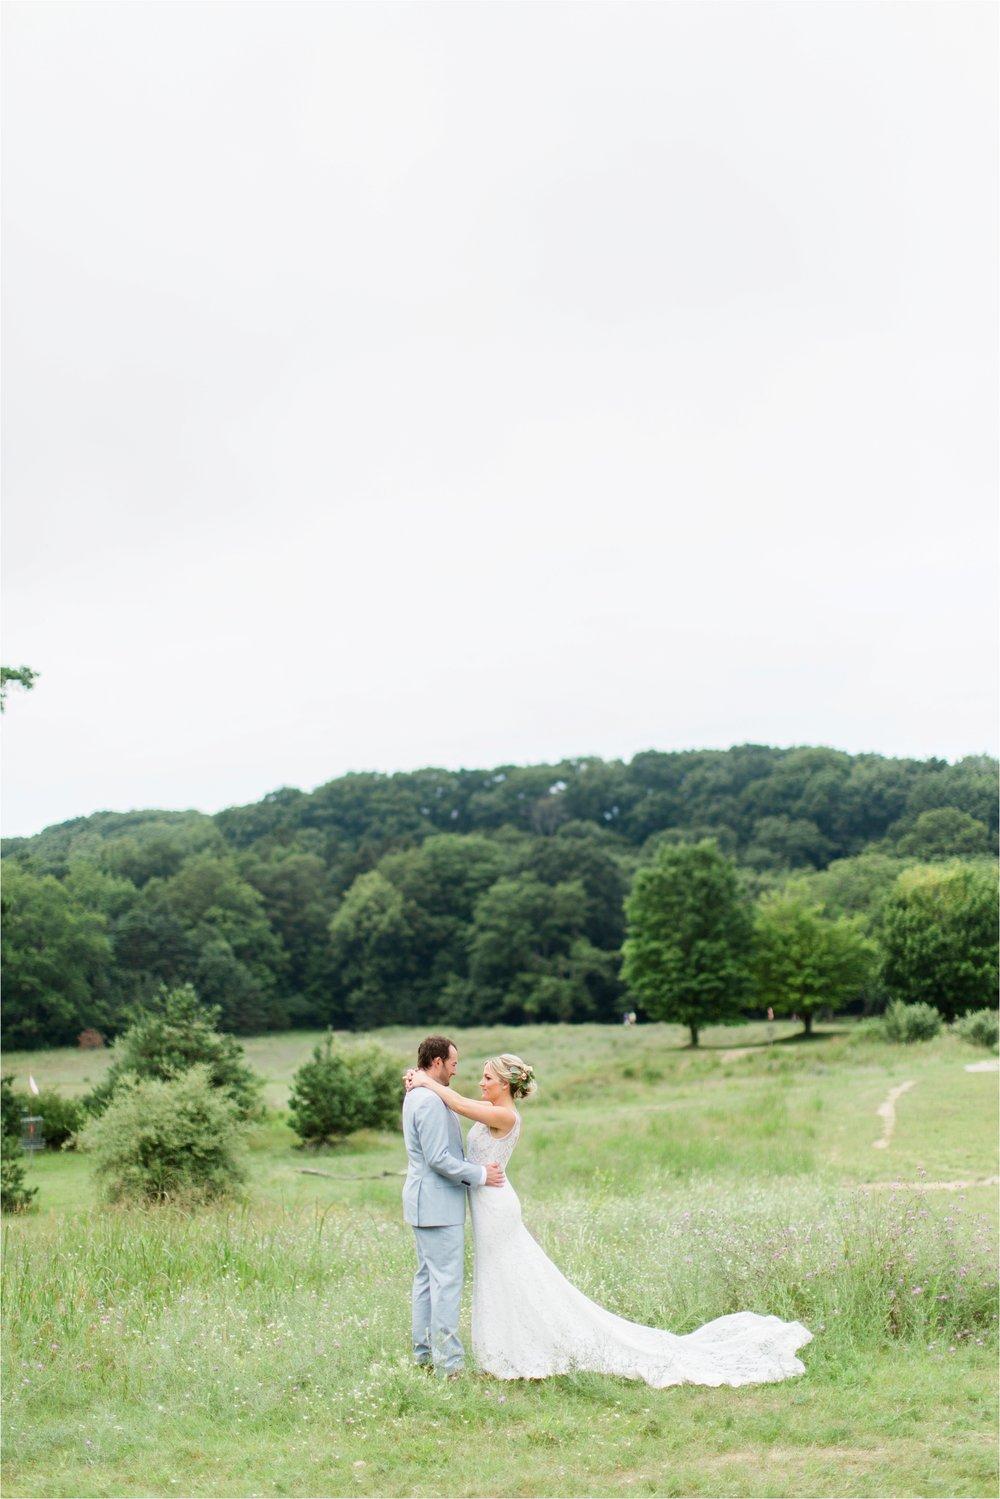 West-Michigan-wedding-photographer-Tifani-Lyn-The-Felt-Mansion-Estate-Wedding-Venue-Rose-Gold-Pink-Lis-Davis_0019.jpg